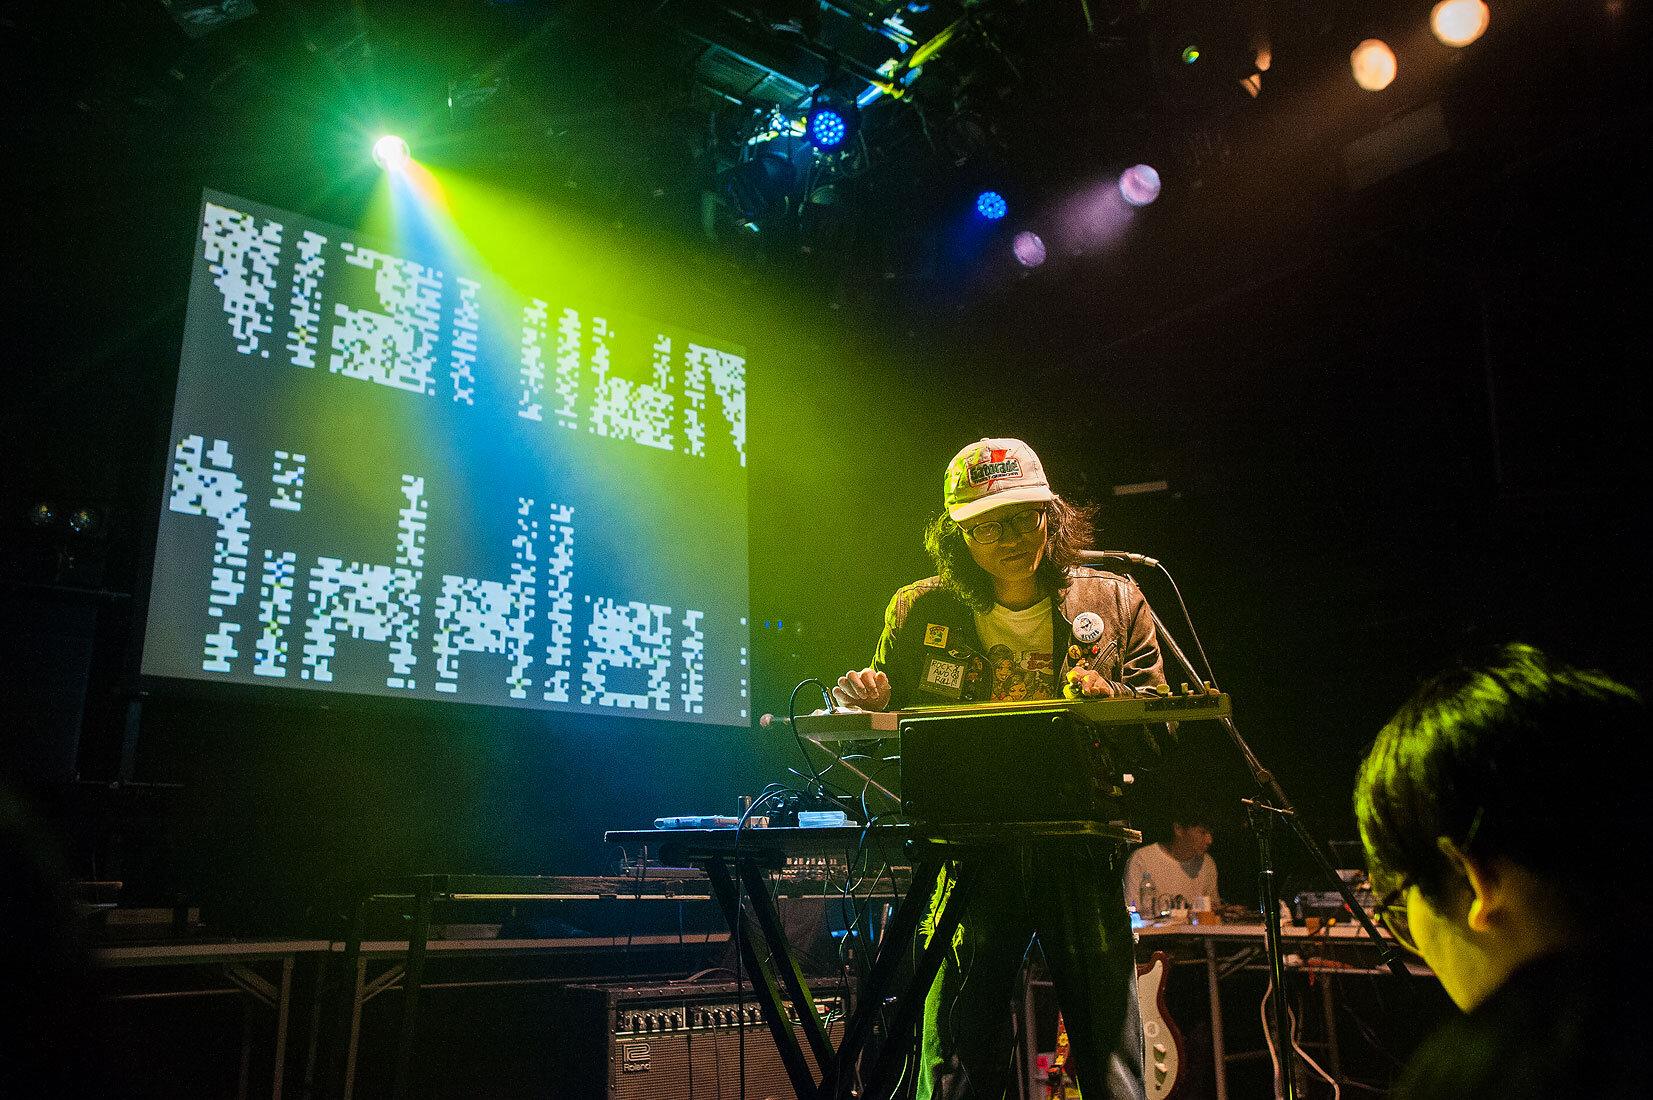 Nishioka Diddley  with visuals by Bolcoantes ( TAKASAKI Yusuke  +  Hermippe )